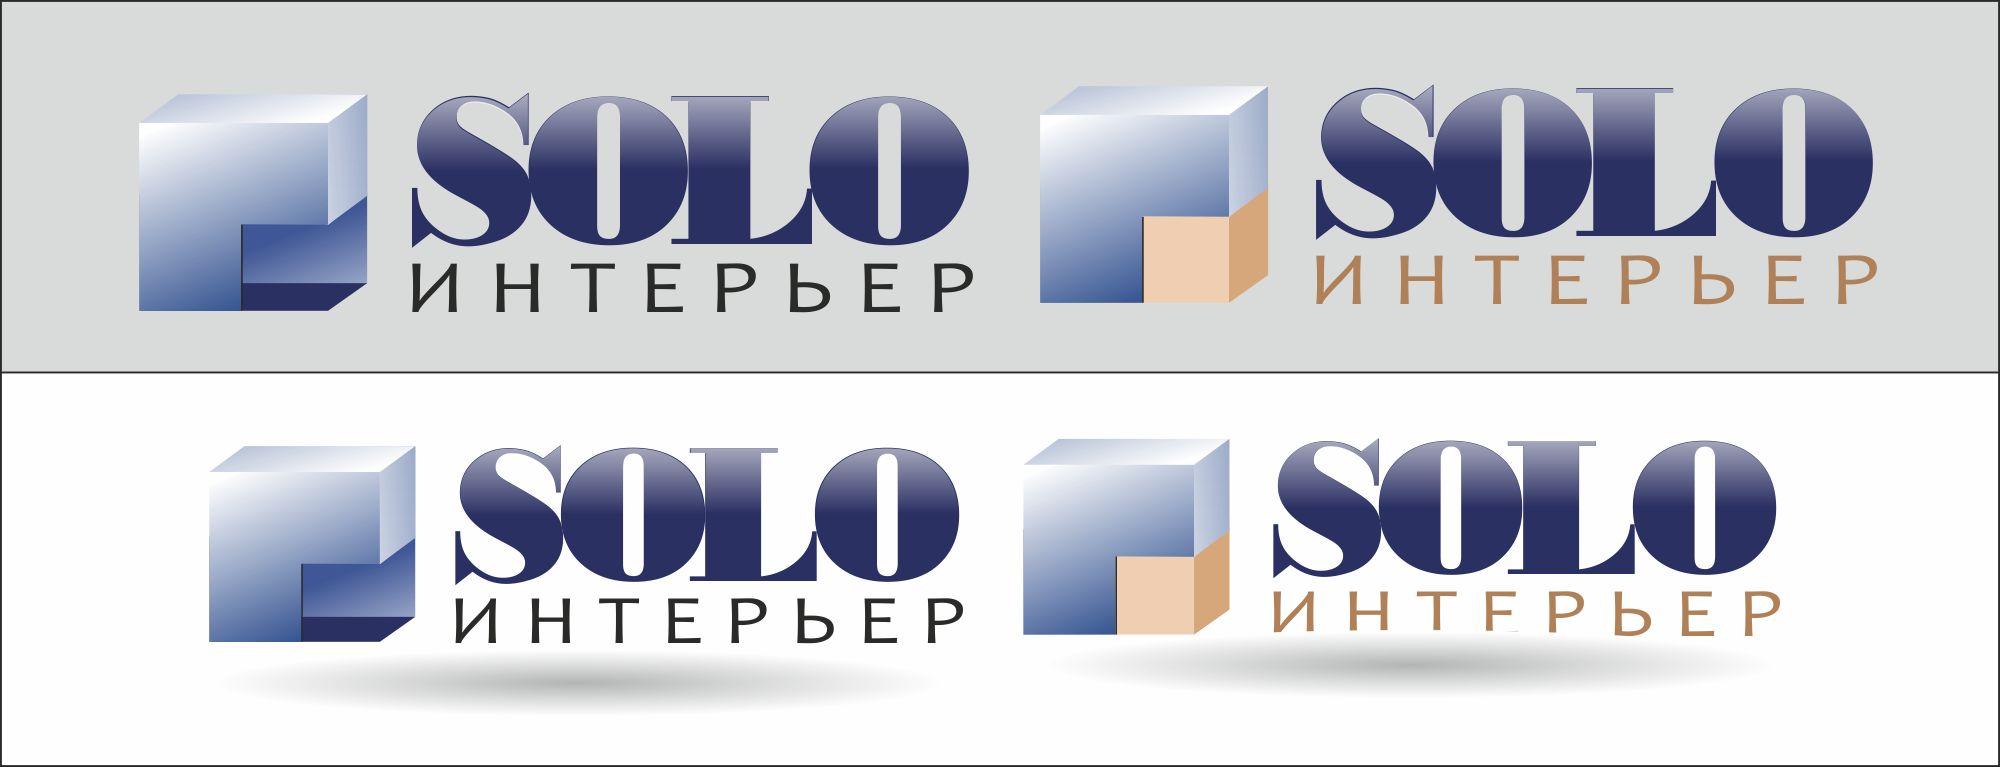 Редизайн логотипа - дизайнер byka-ve7rov